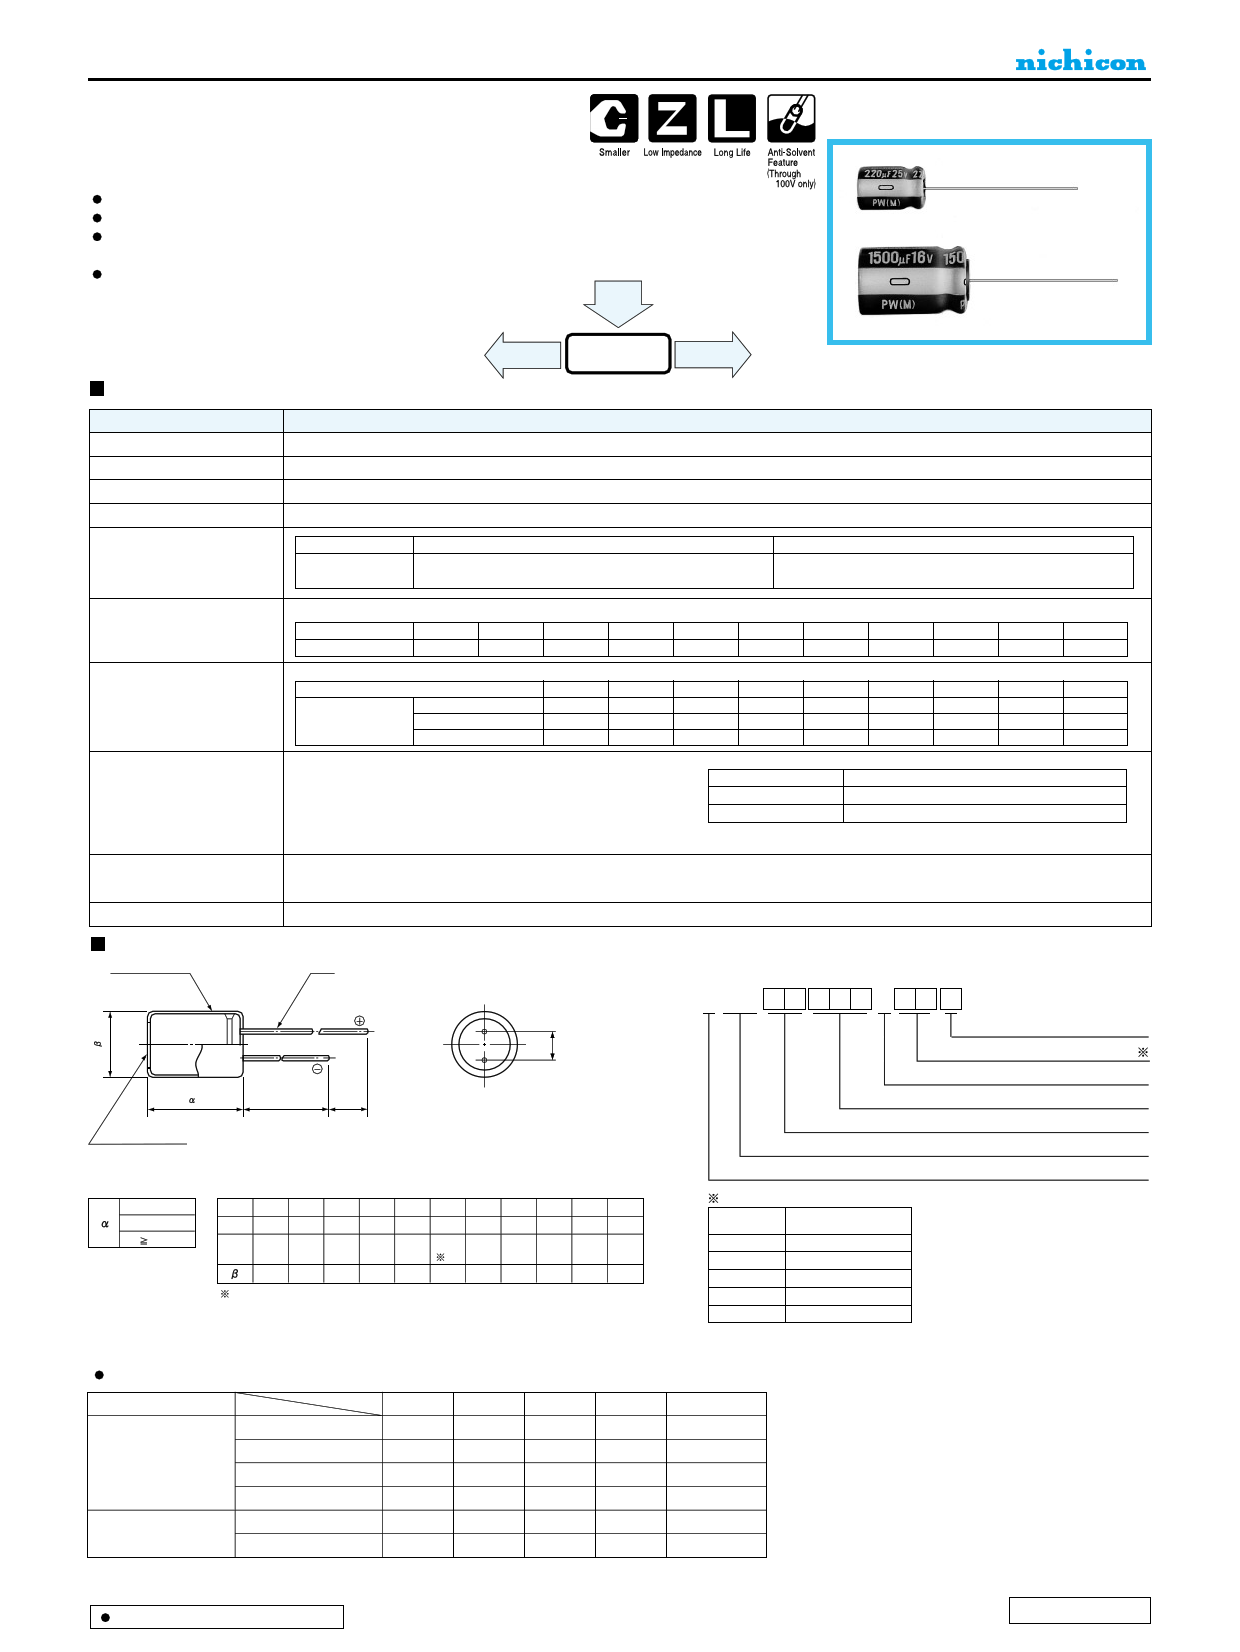 UPW1C681MPD1TD 데이터시트 및 UPW1C681MPD1TD PDF